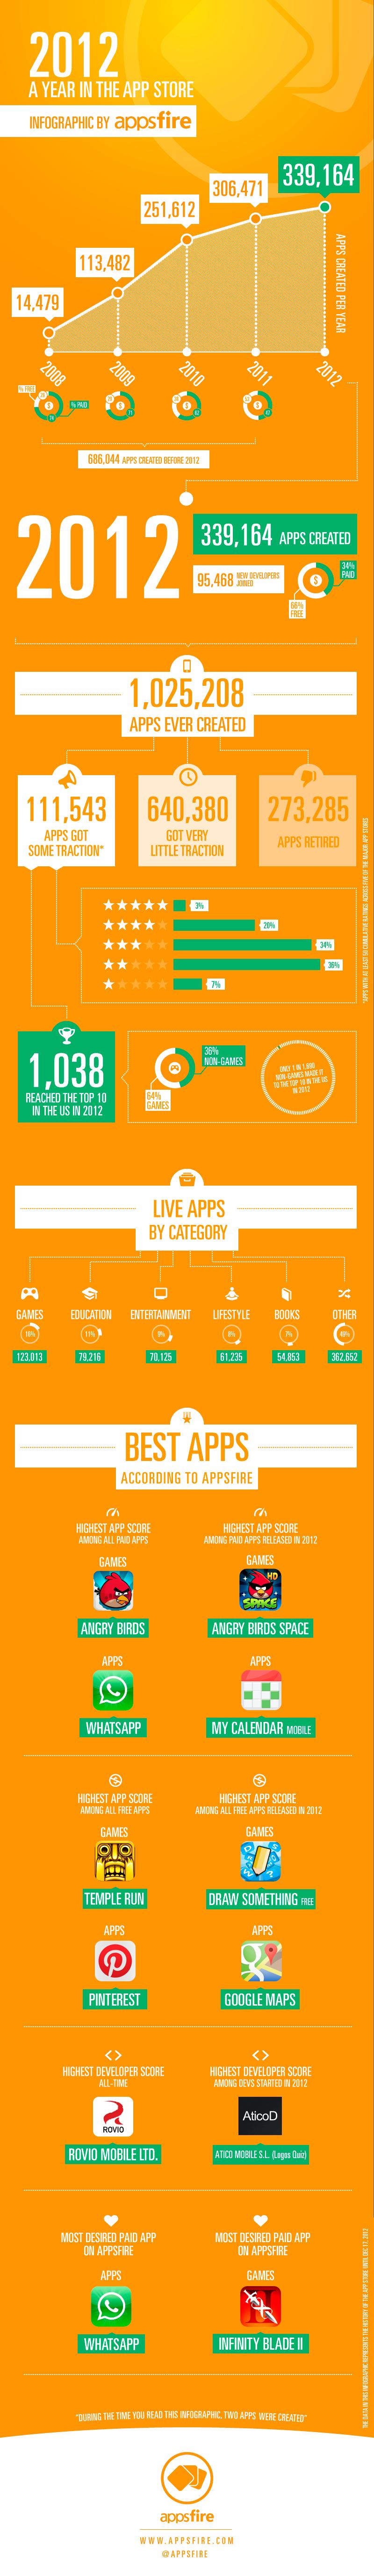 Статистика приложений в App Store за 2012 год - из 750 000 топа достигли лишь 1 000